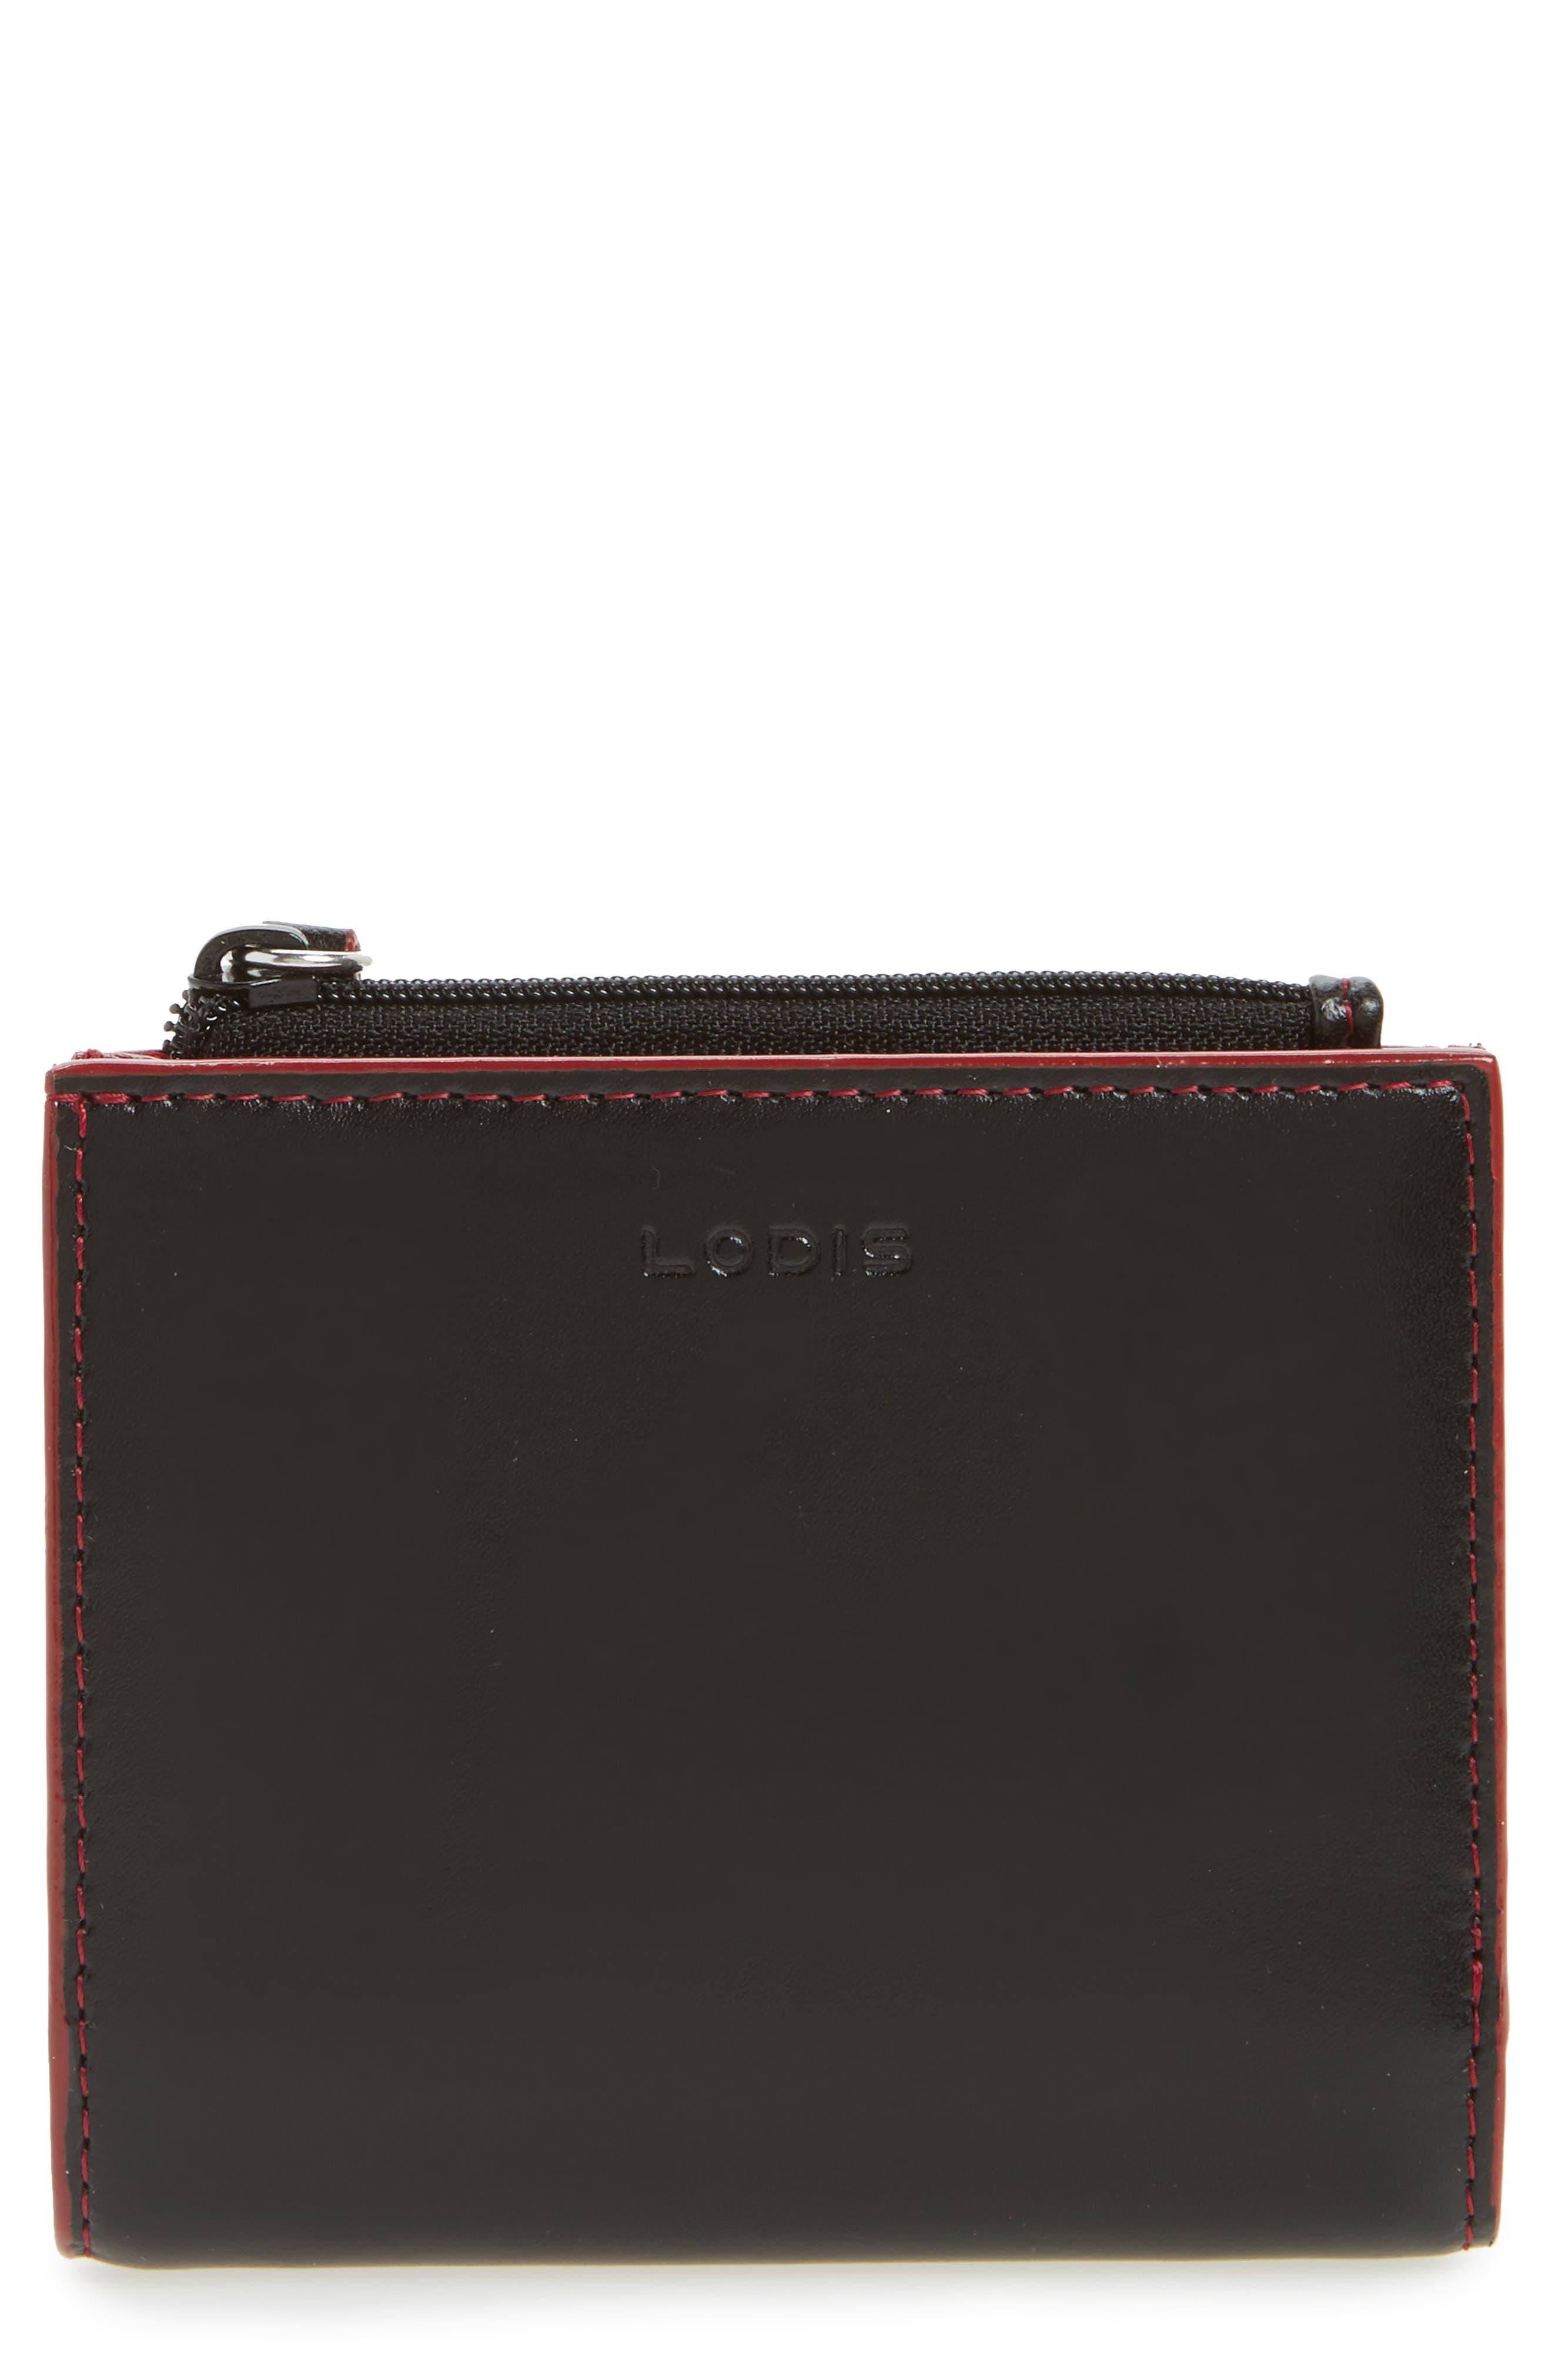 Lodis Audrey Under Lock & Key Aldis Leather Wallet